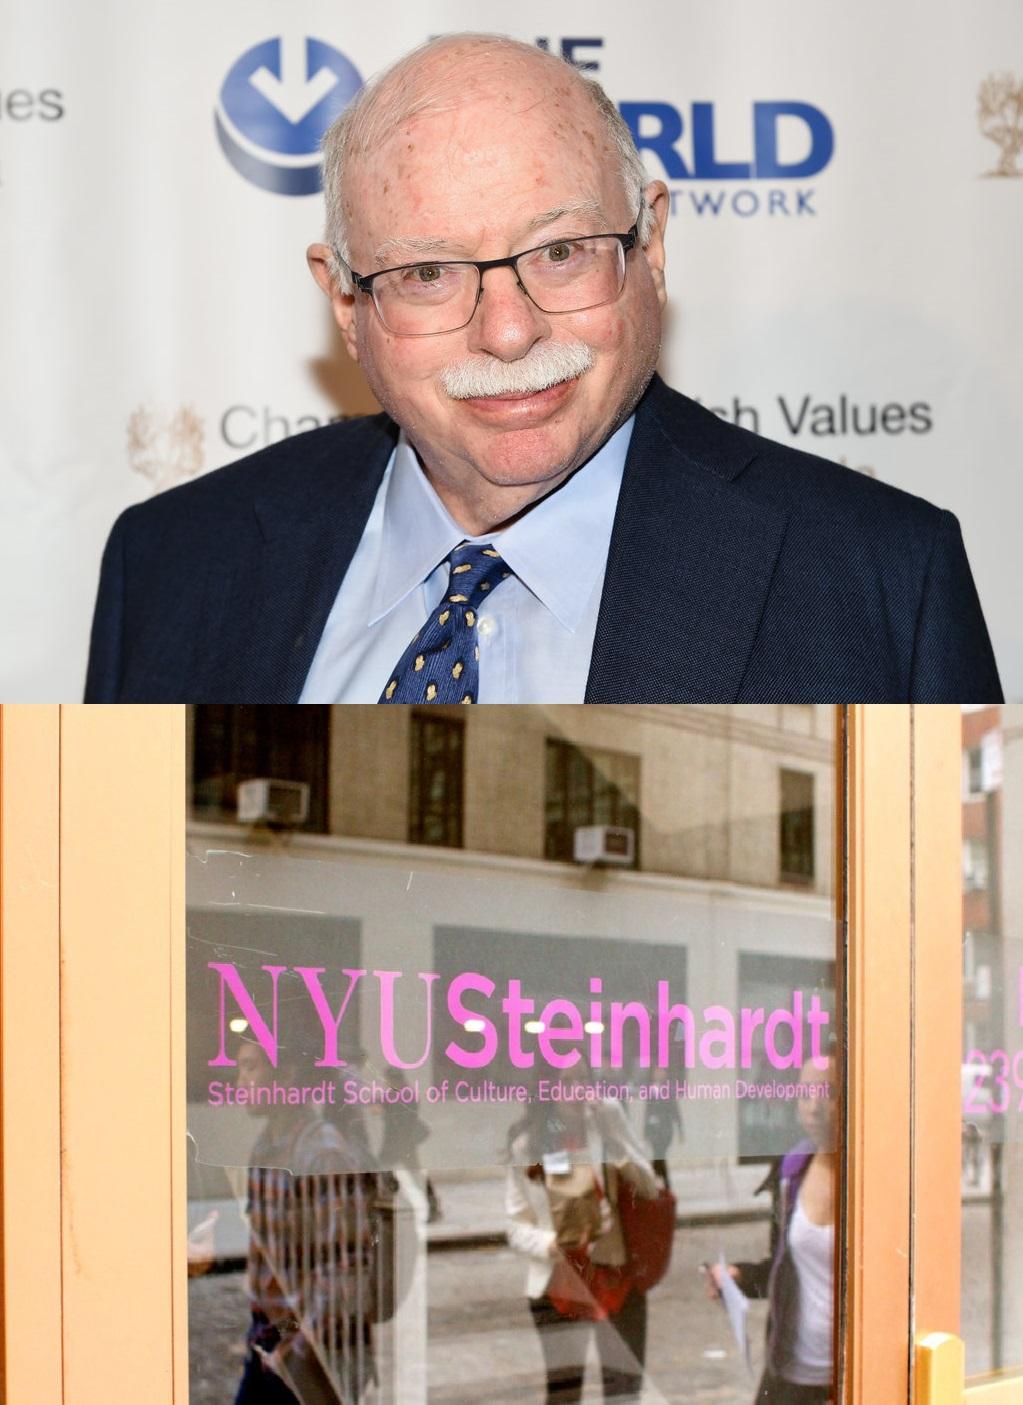 Michael Steinhardt investigated by NYU-combo.jpg